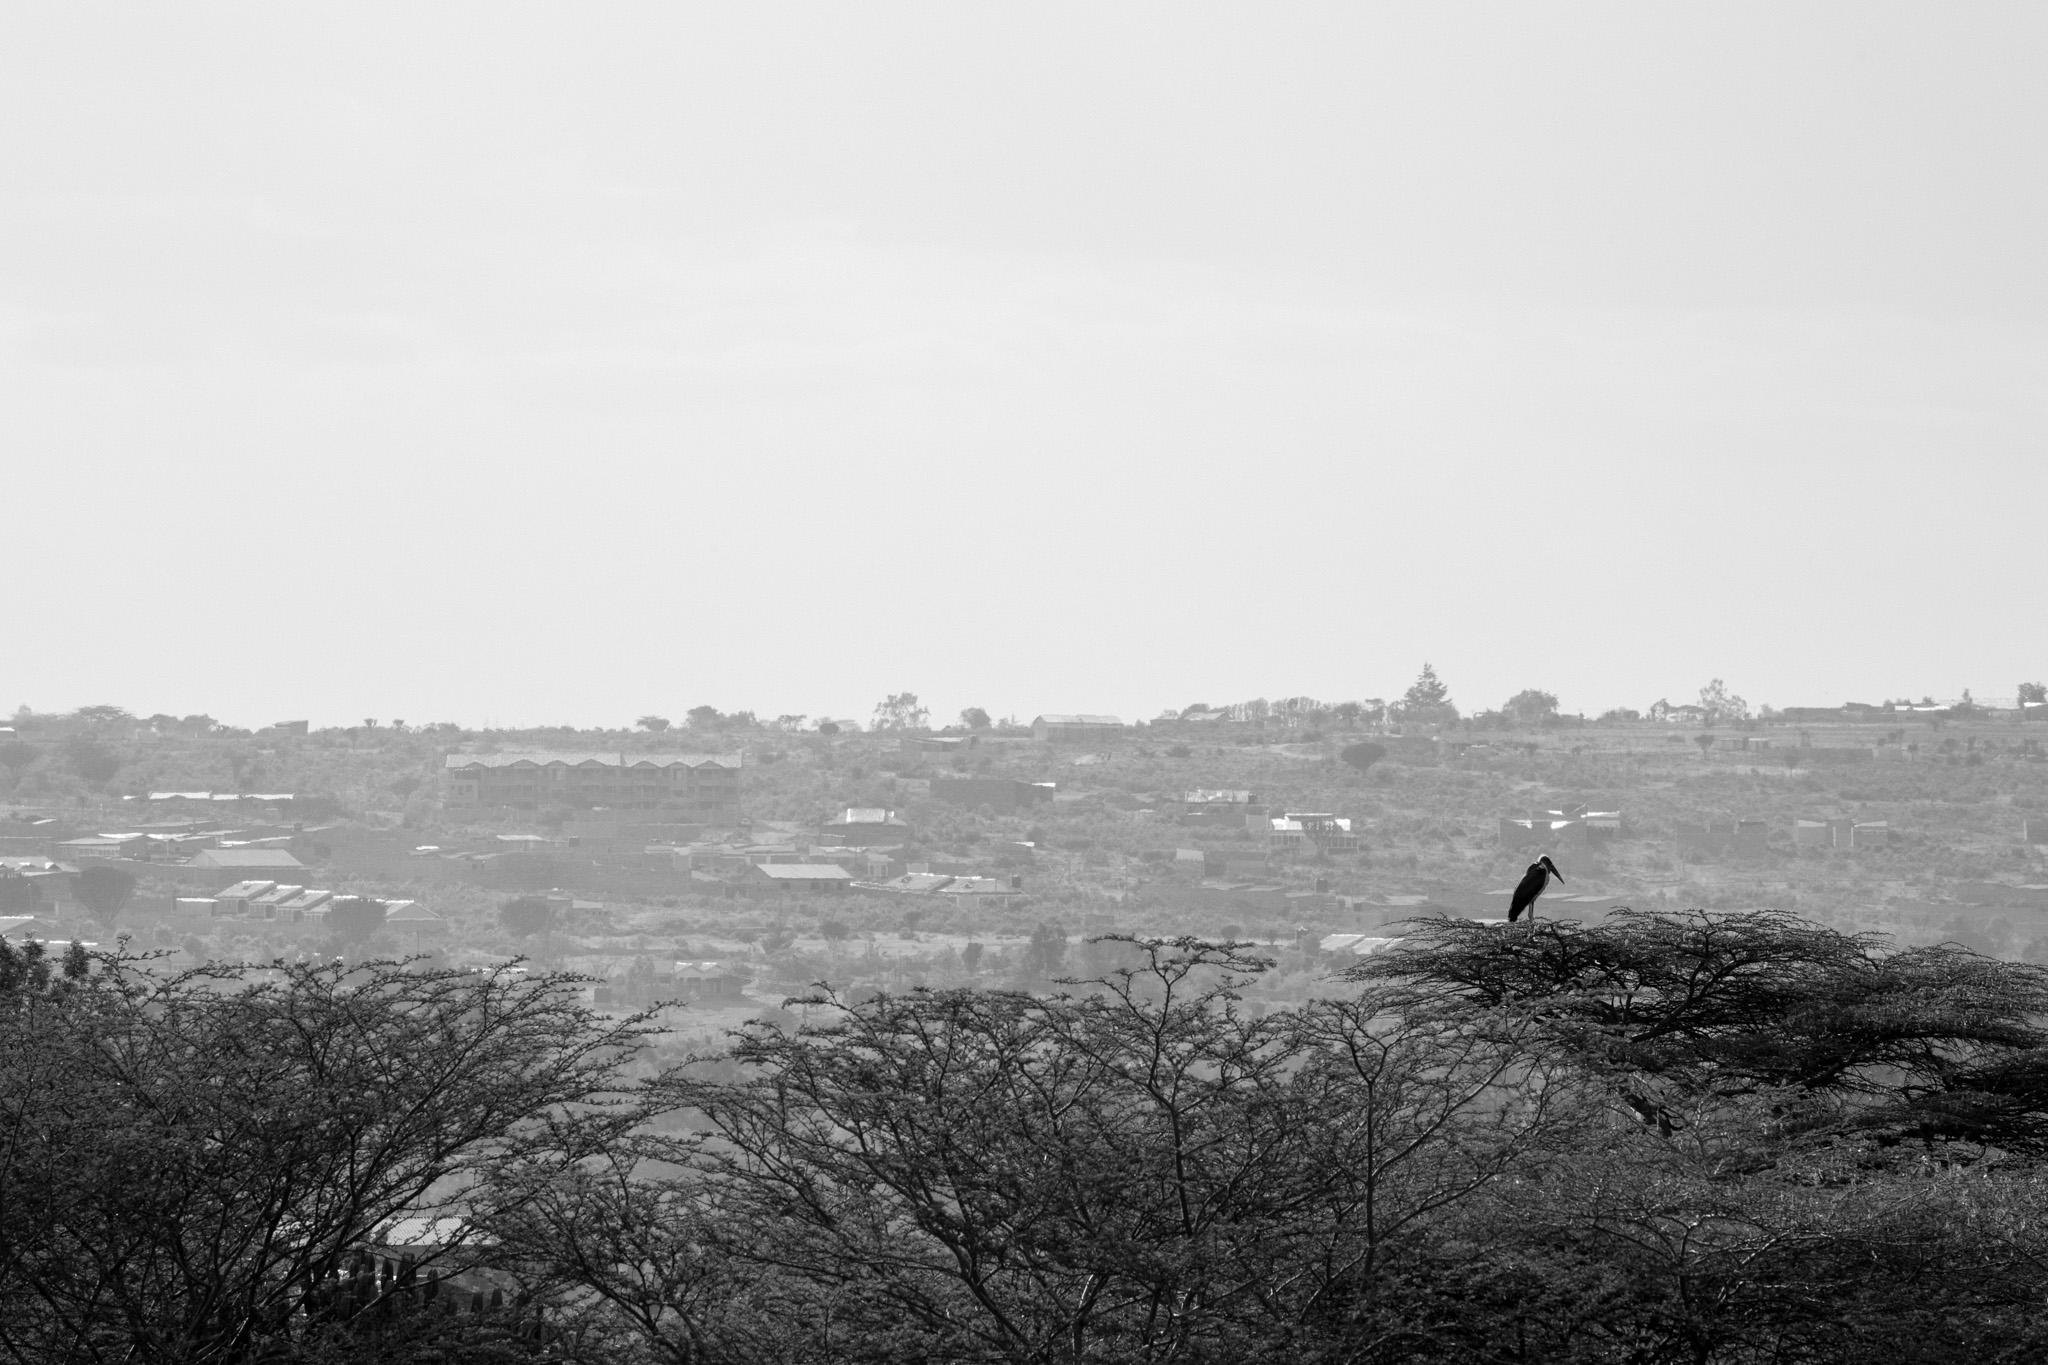 Marabou Stork resting on an Acacia tree.